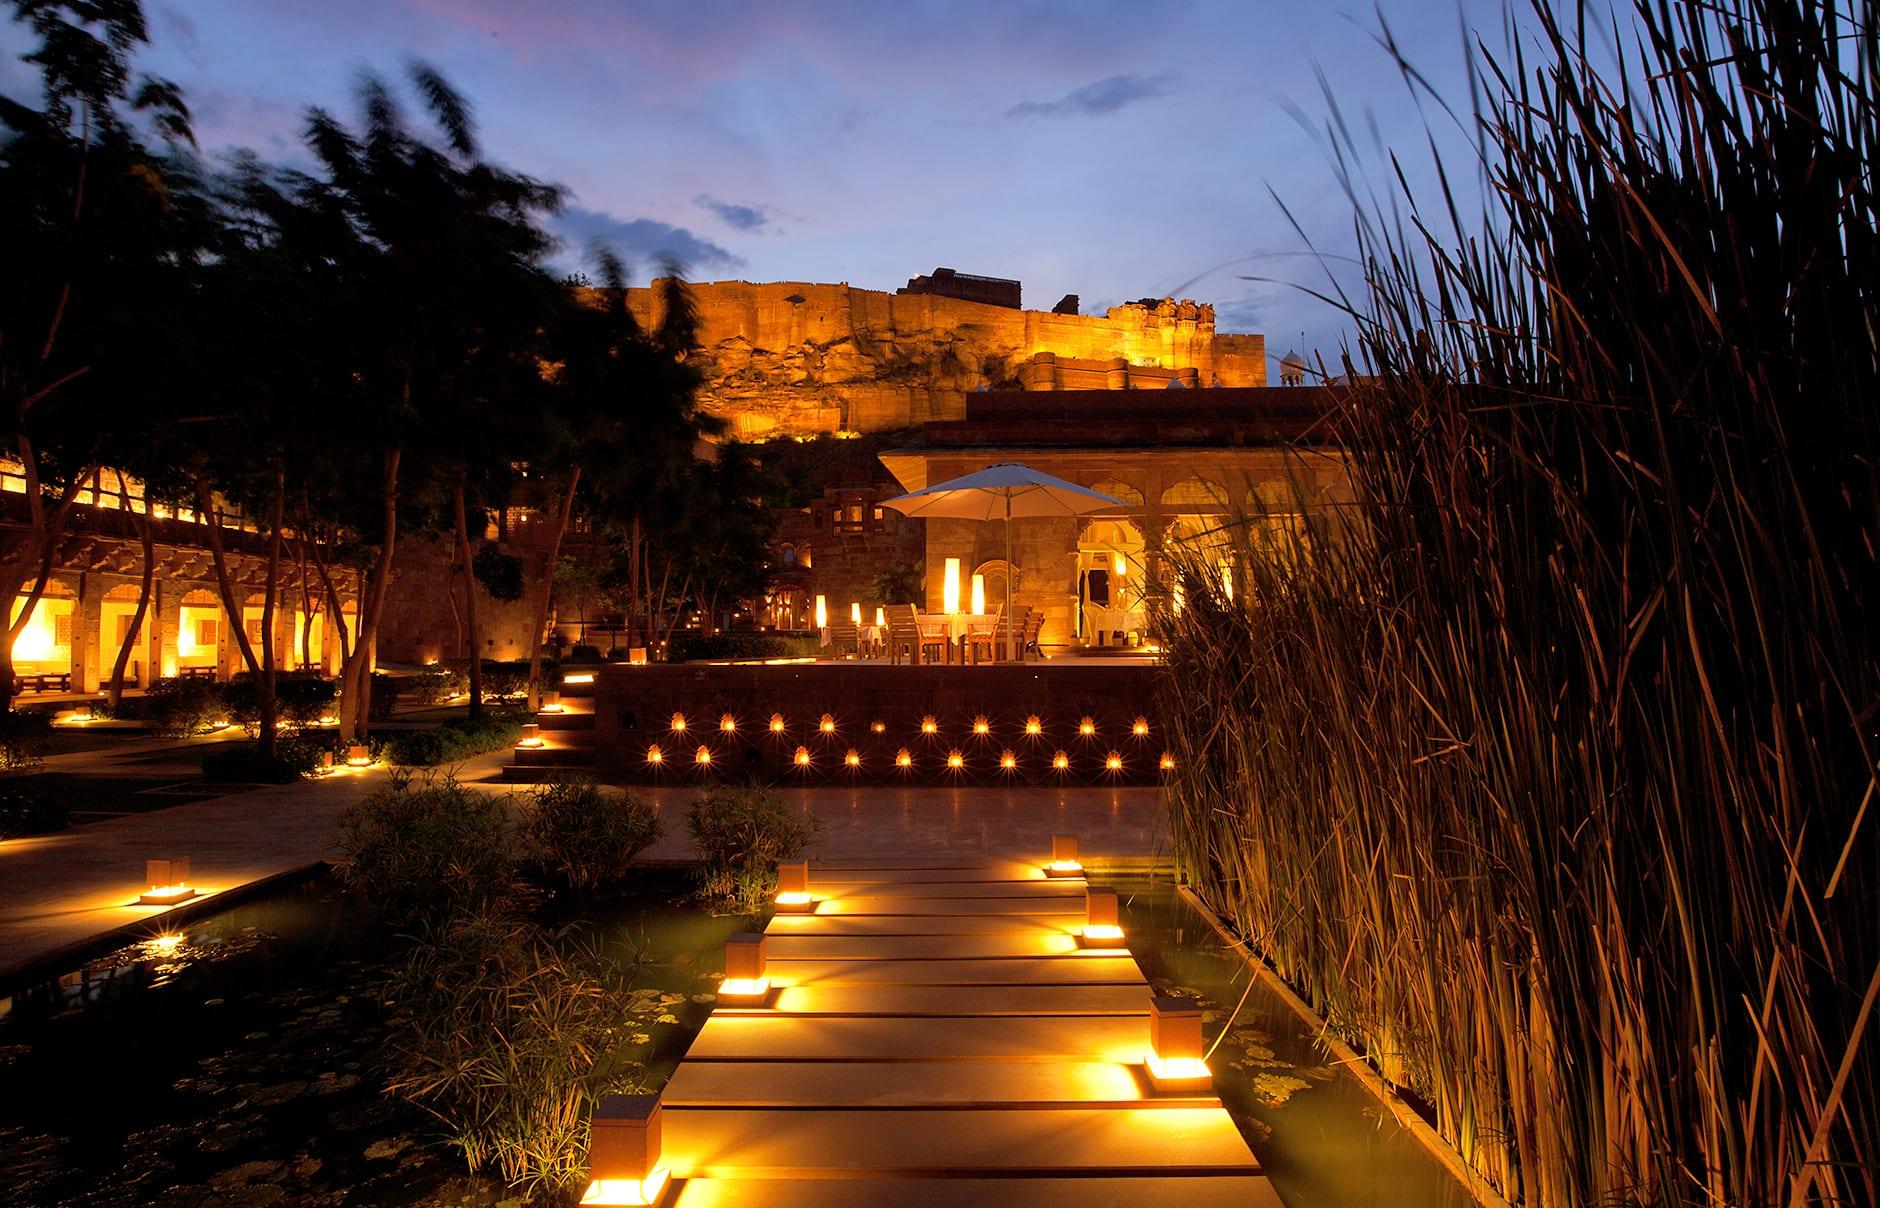 Raas evening view. Raas Jodhpur, India. © Rass